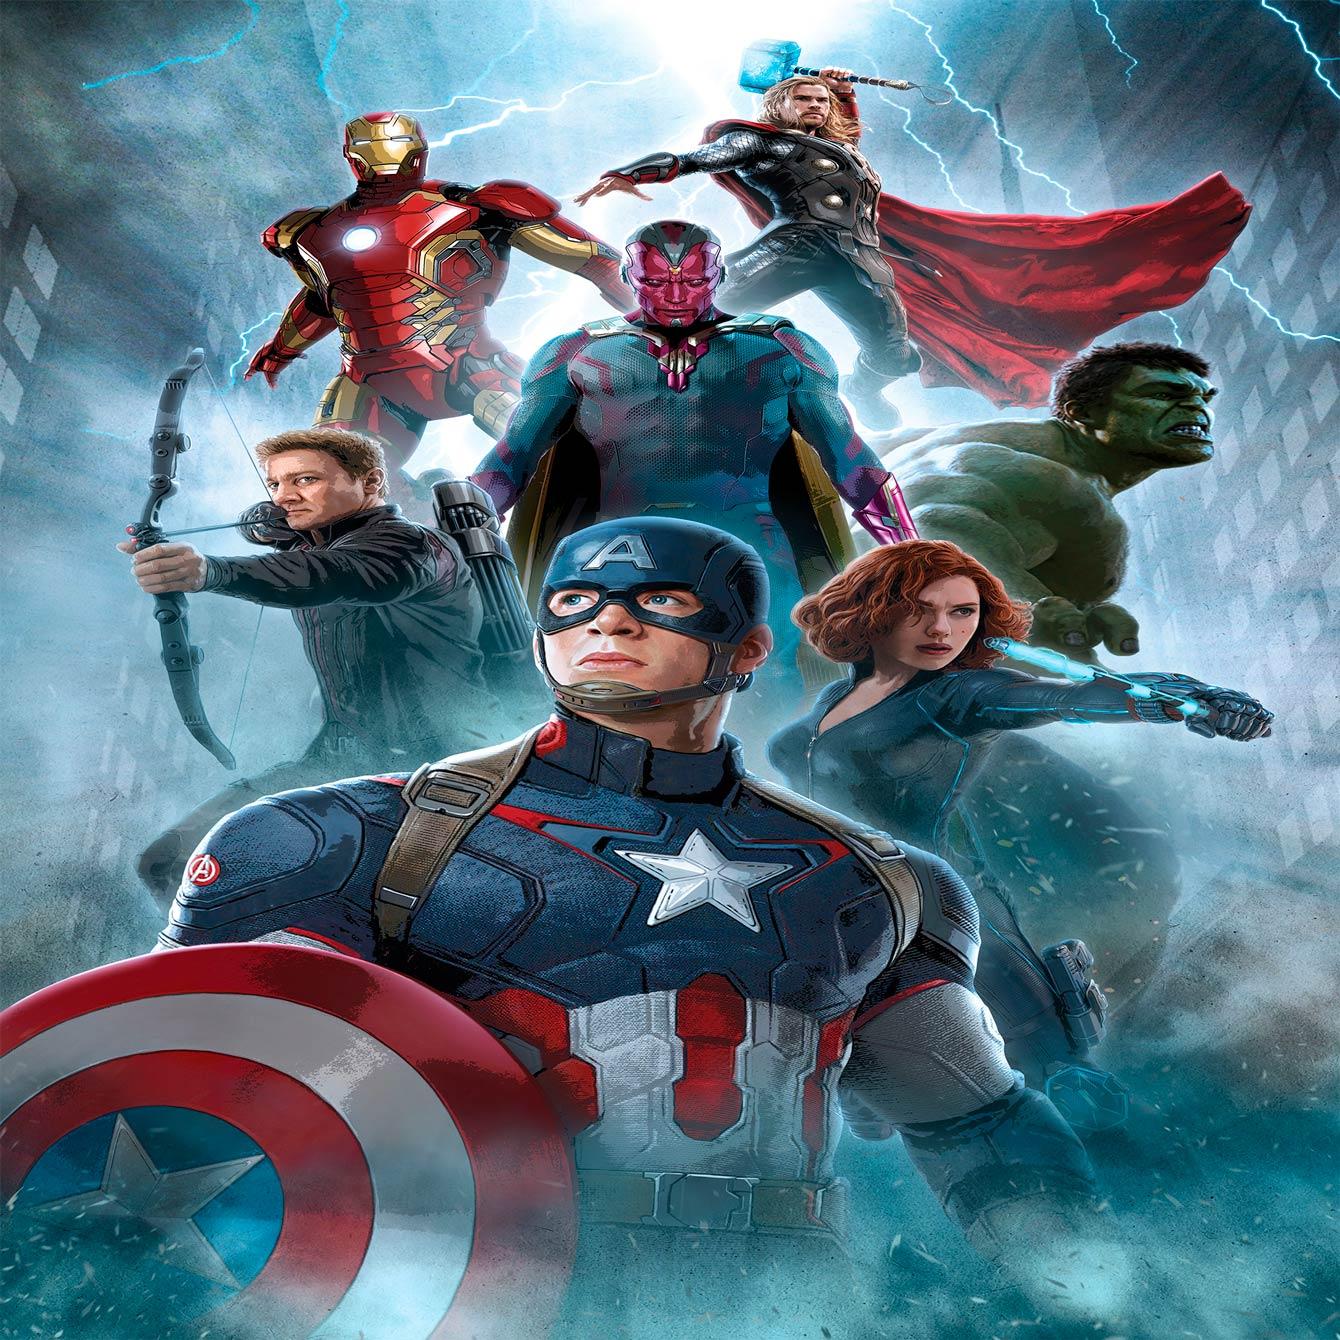 Papel De Parede Adesivo, Infantil Vingadores Marvel Clássico  - Final Decor